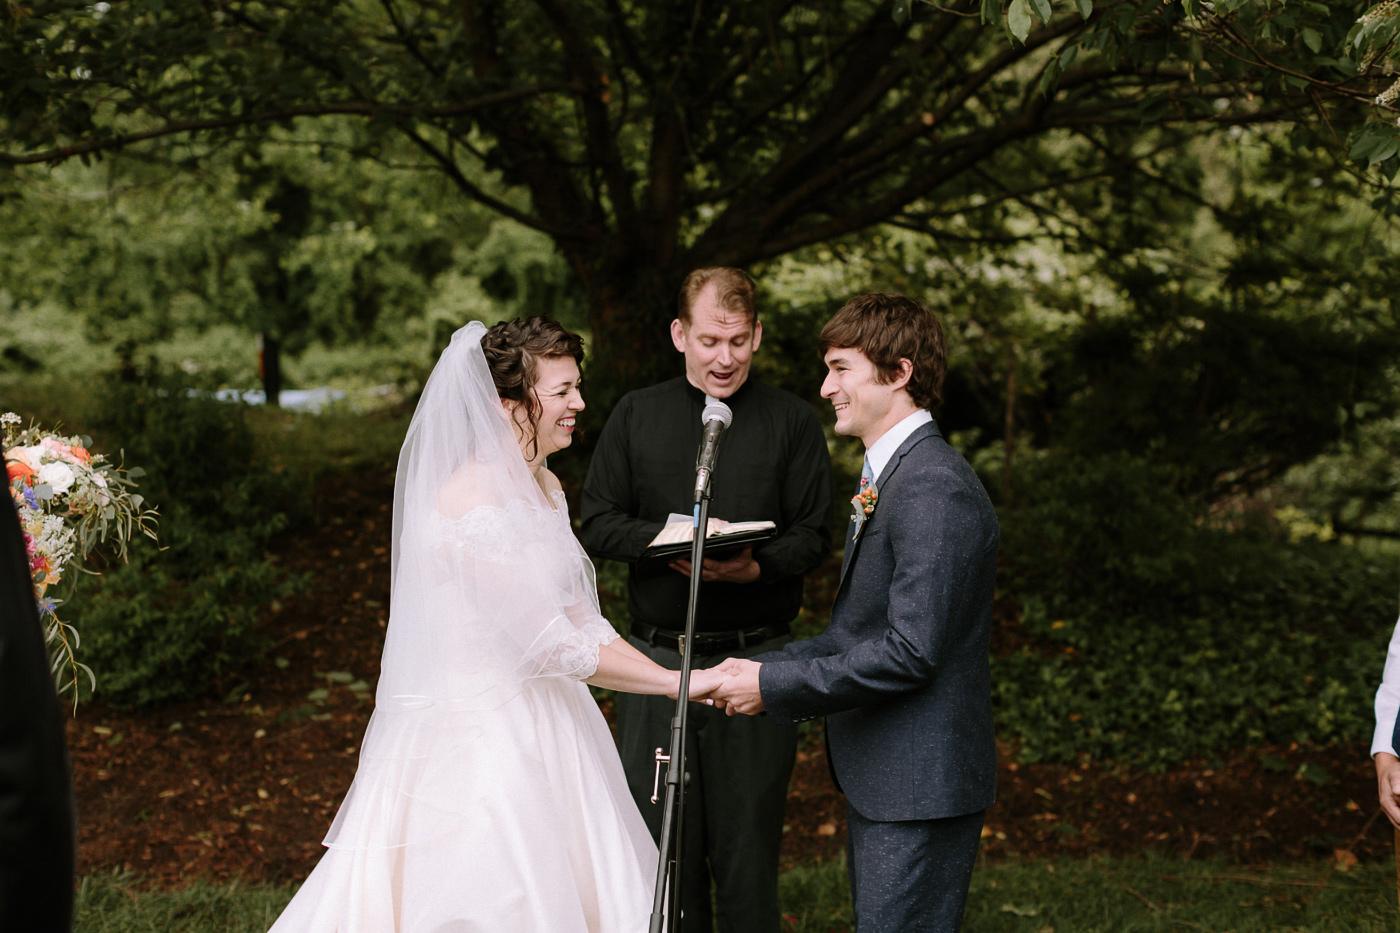 Hannah and Houston backyard wedding ceremony